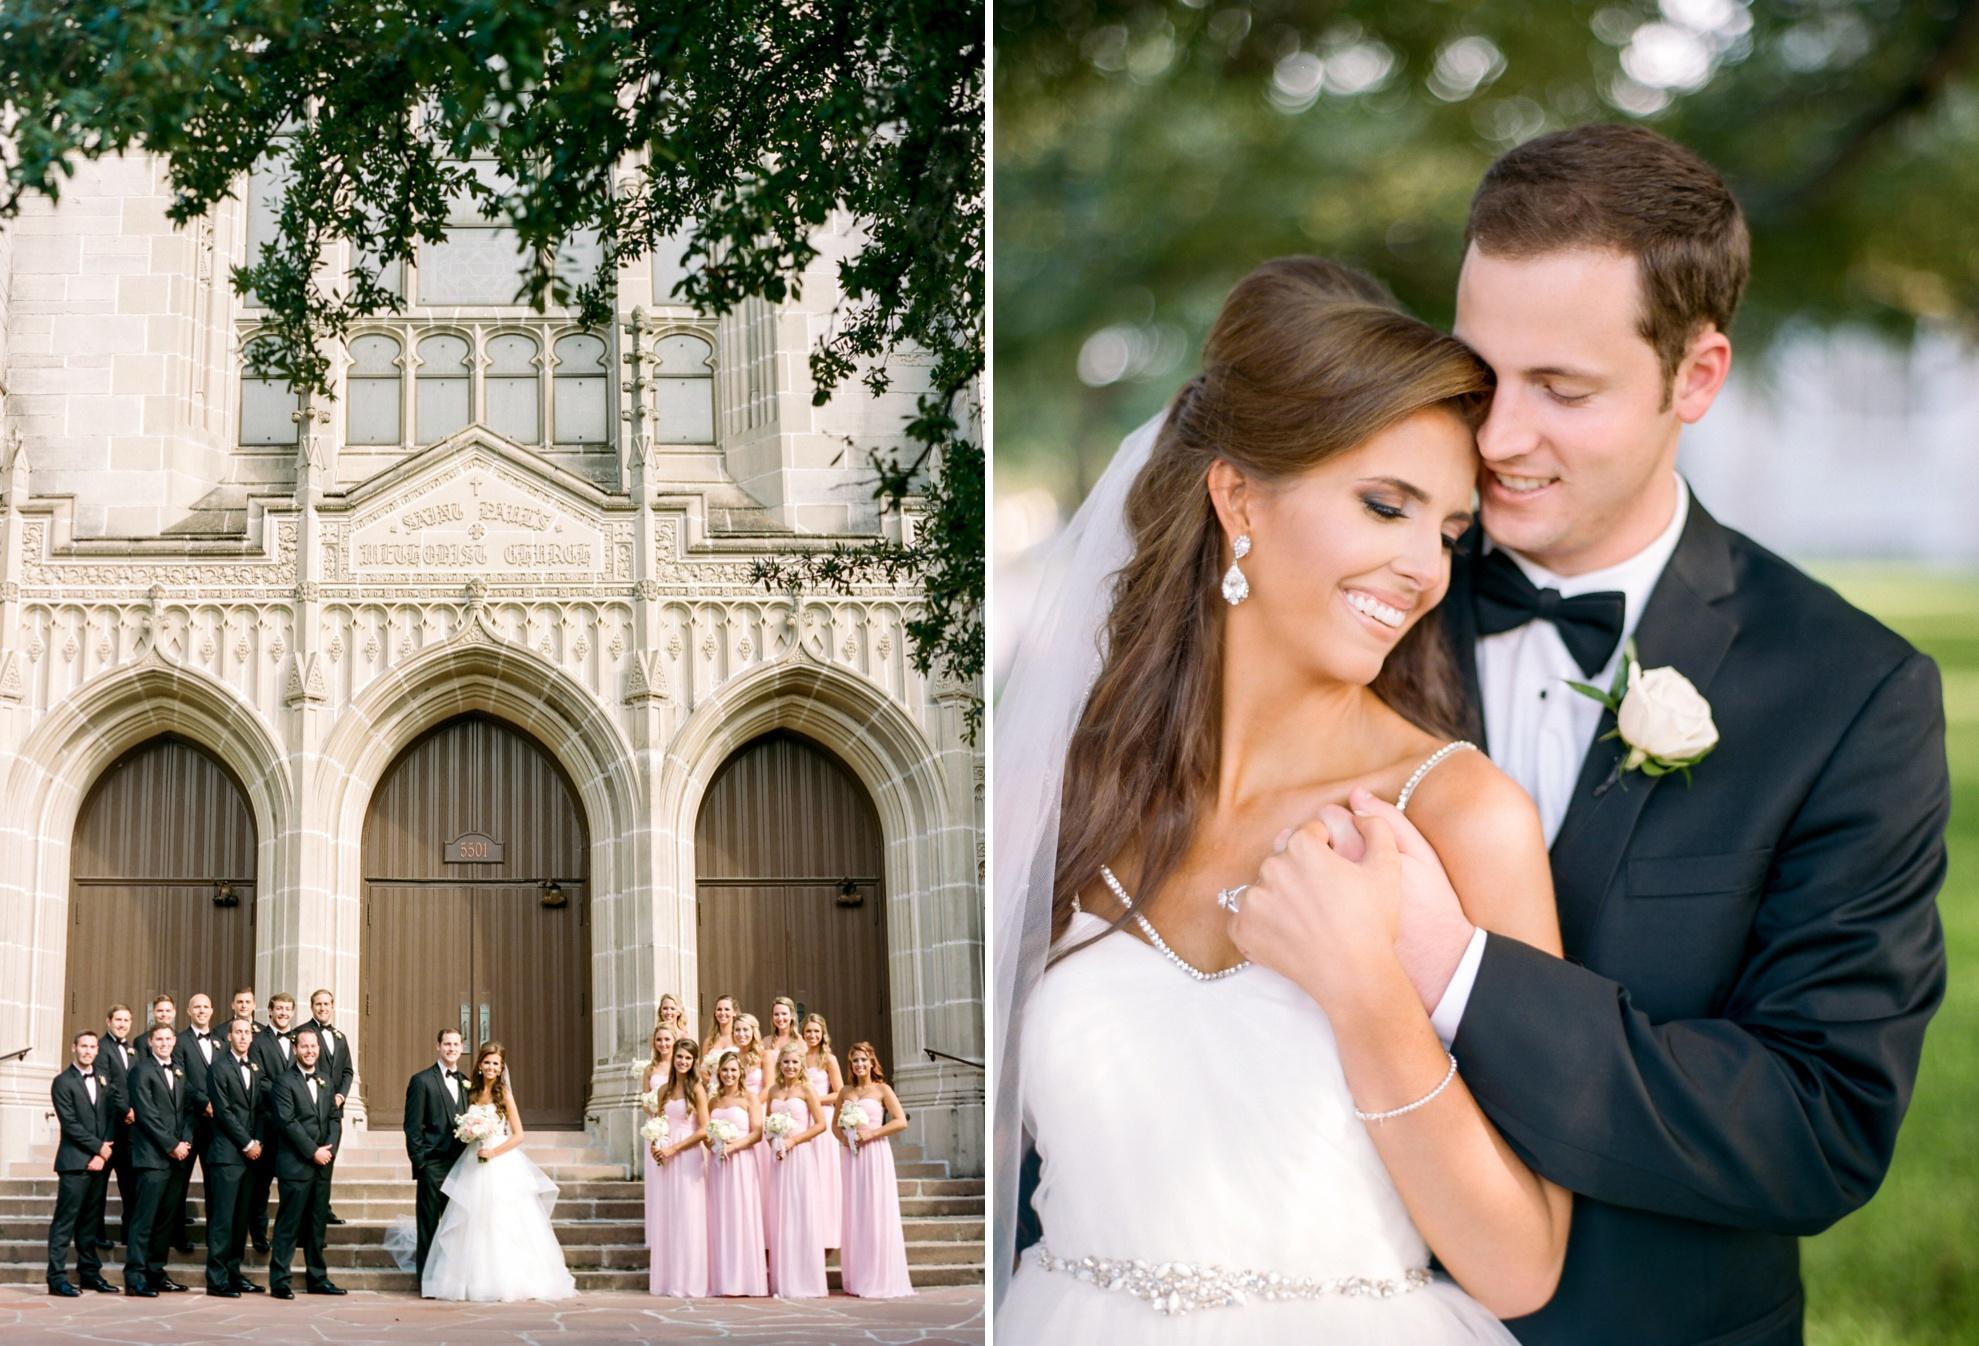 St-Paul's-United Methodist-Wedding-Houston-Photographer-Dana-Fernandez-Weddings-In-Houston-Magazine-Feature-7.jpg